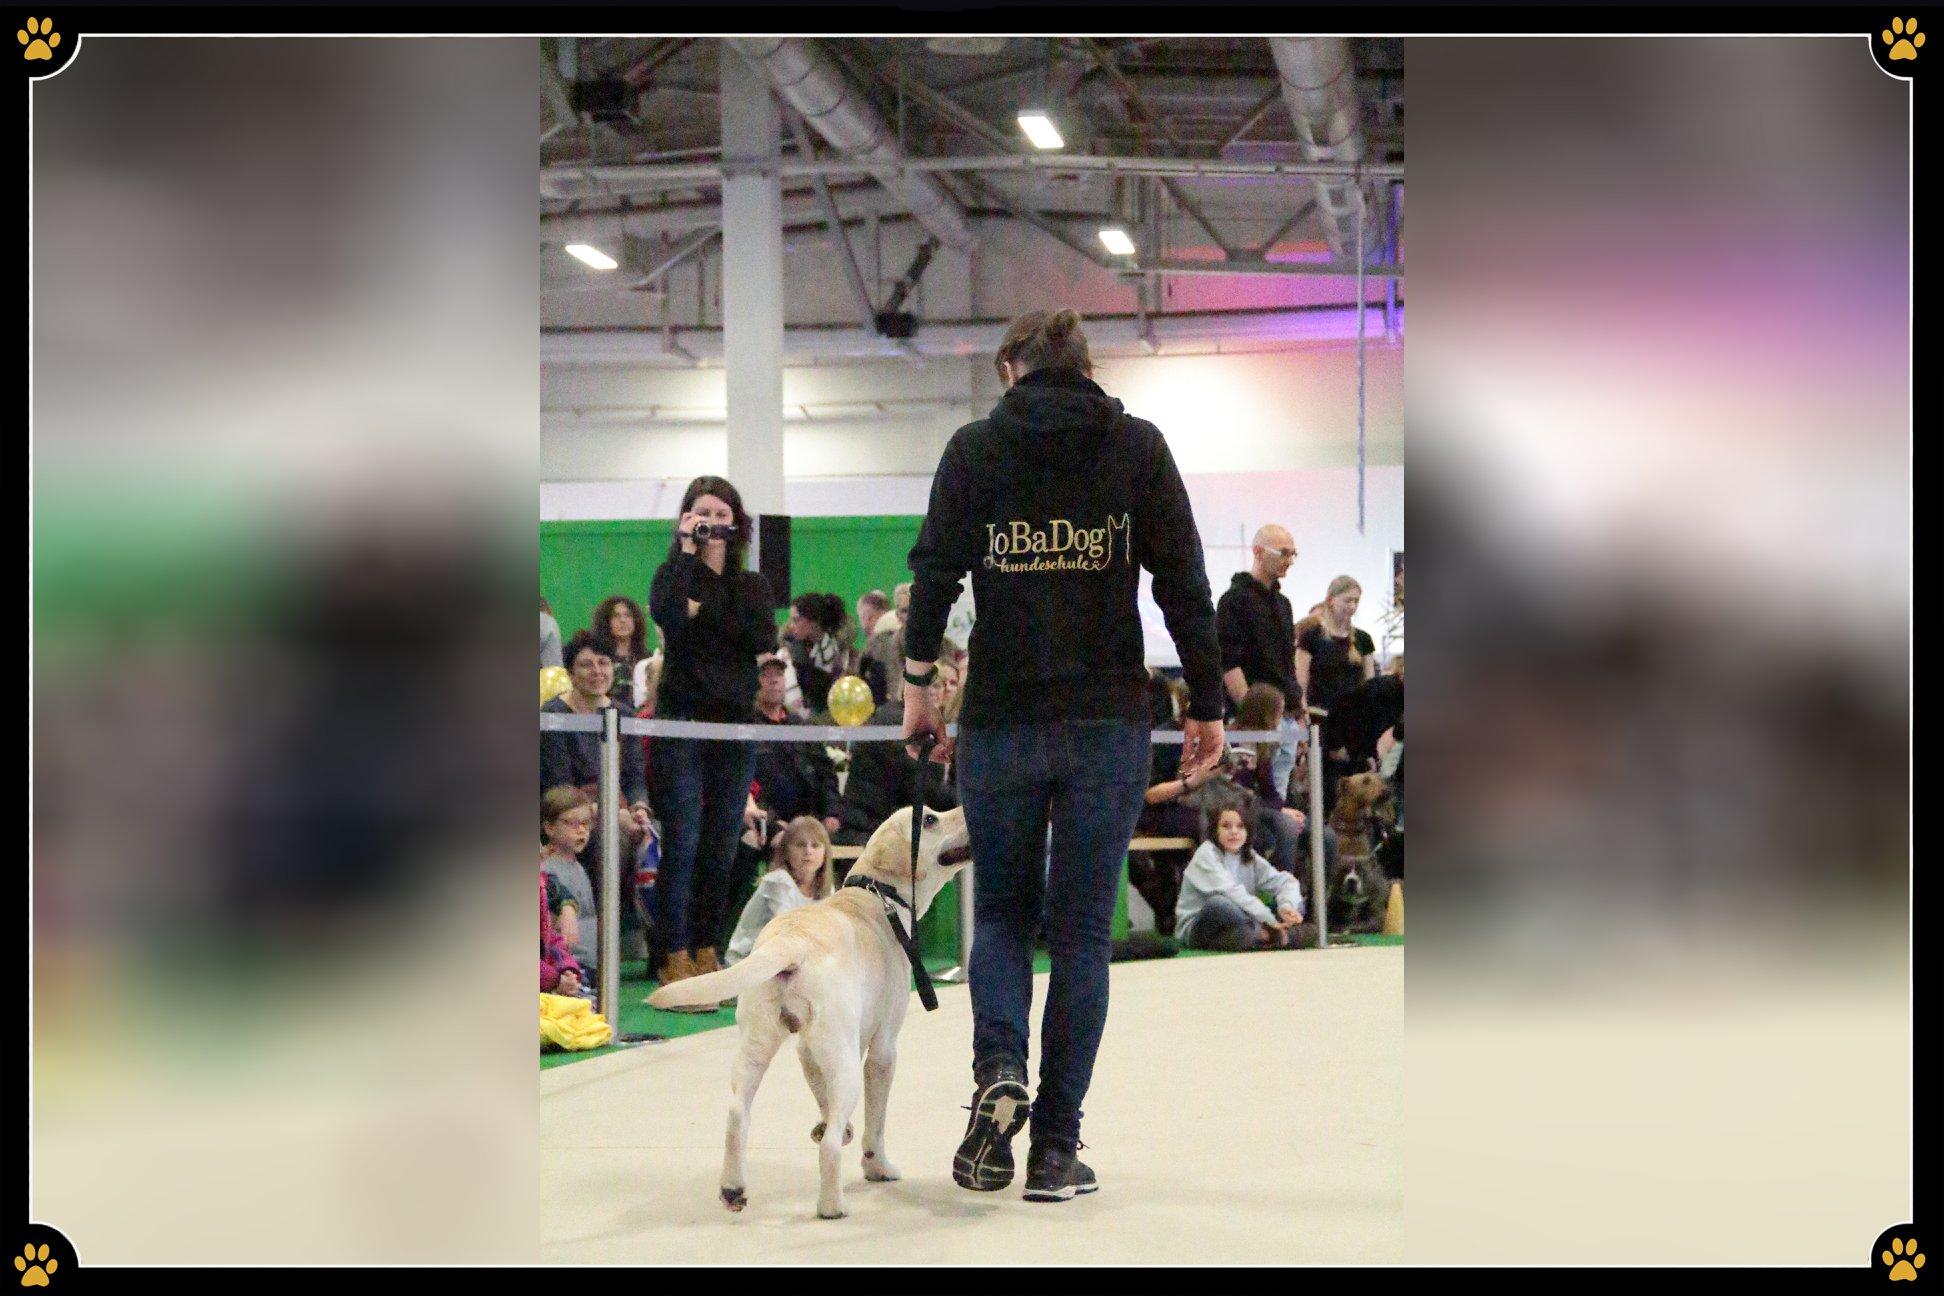 JoBaDog_Gruene_Woche_2019_Labrador.jpg